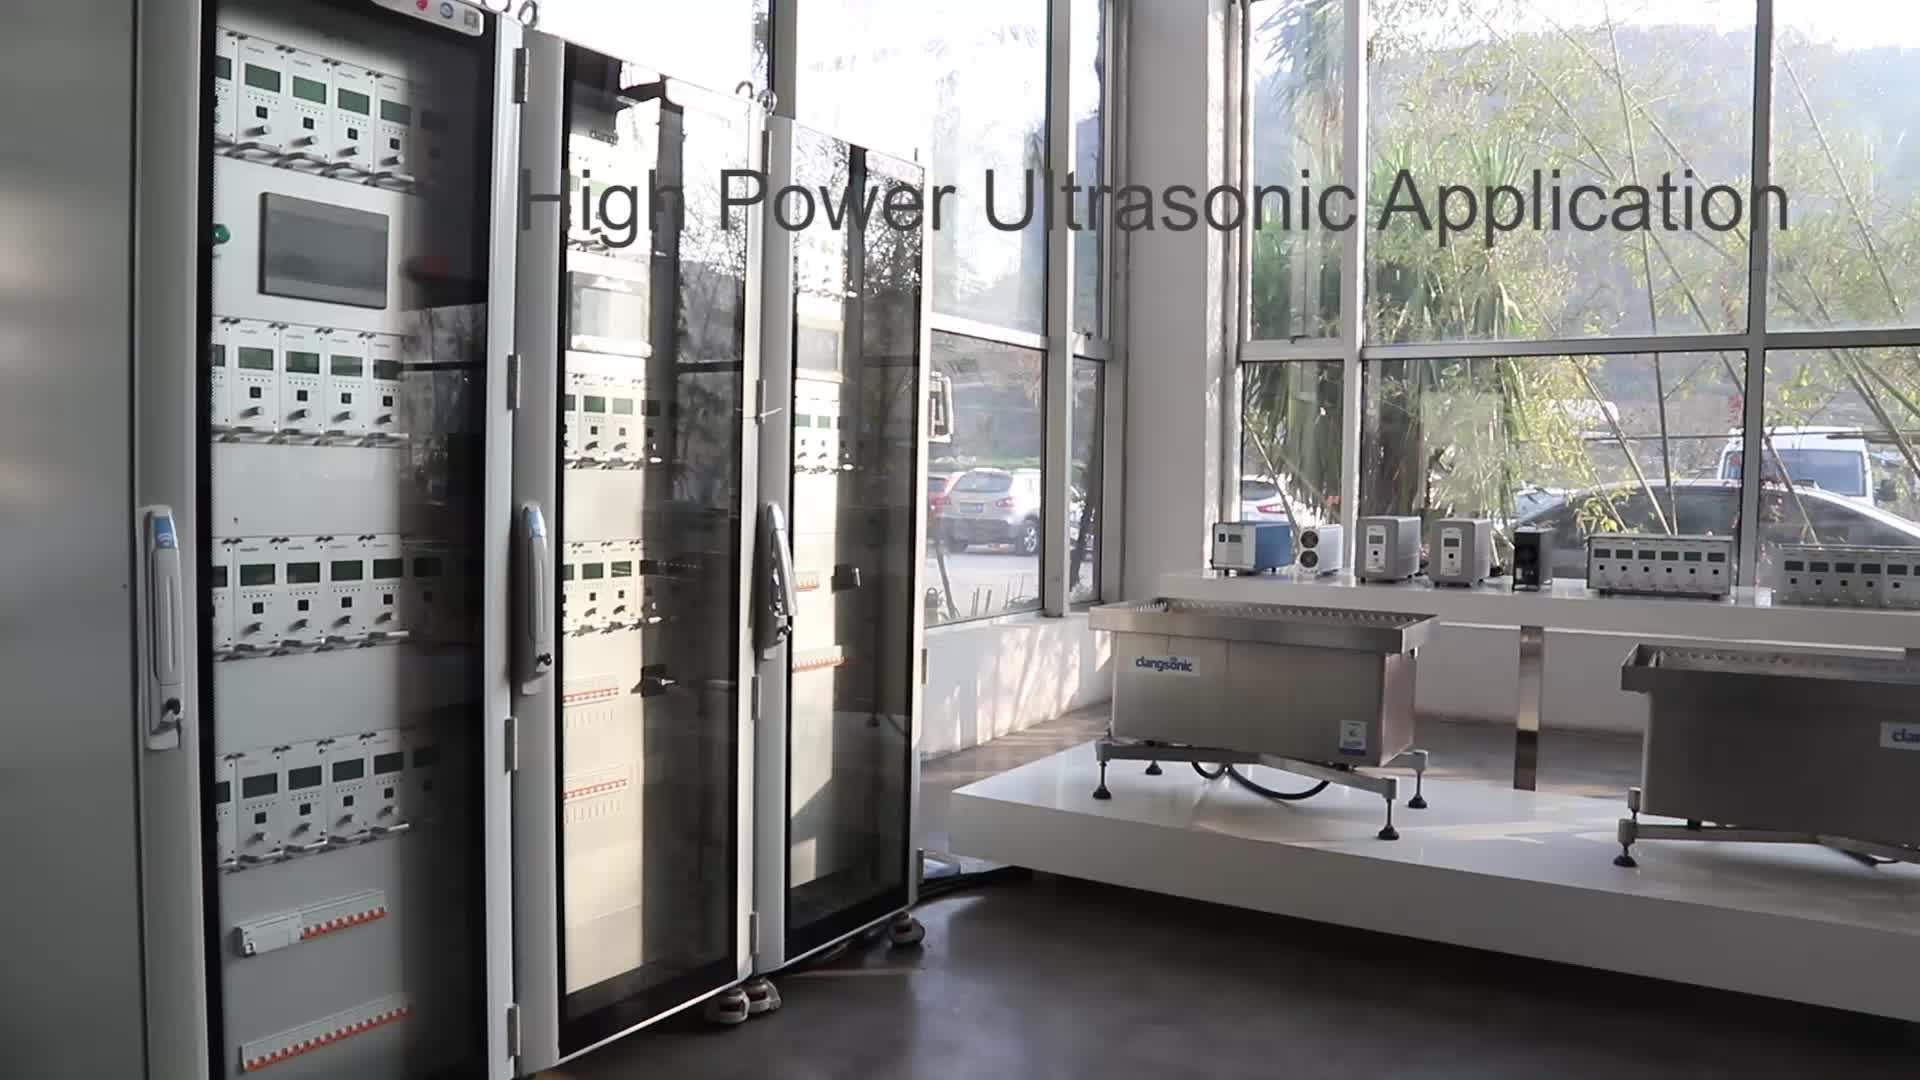 clangsonic 20khz ultrasonic frequency generator  ultrasonic welding generator  for mask welding